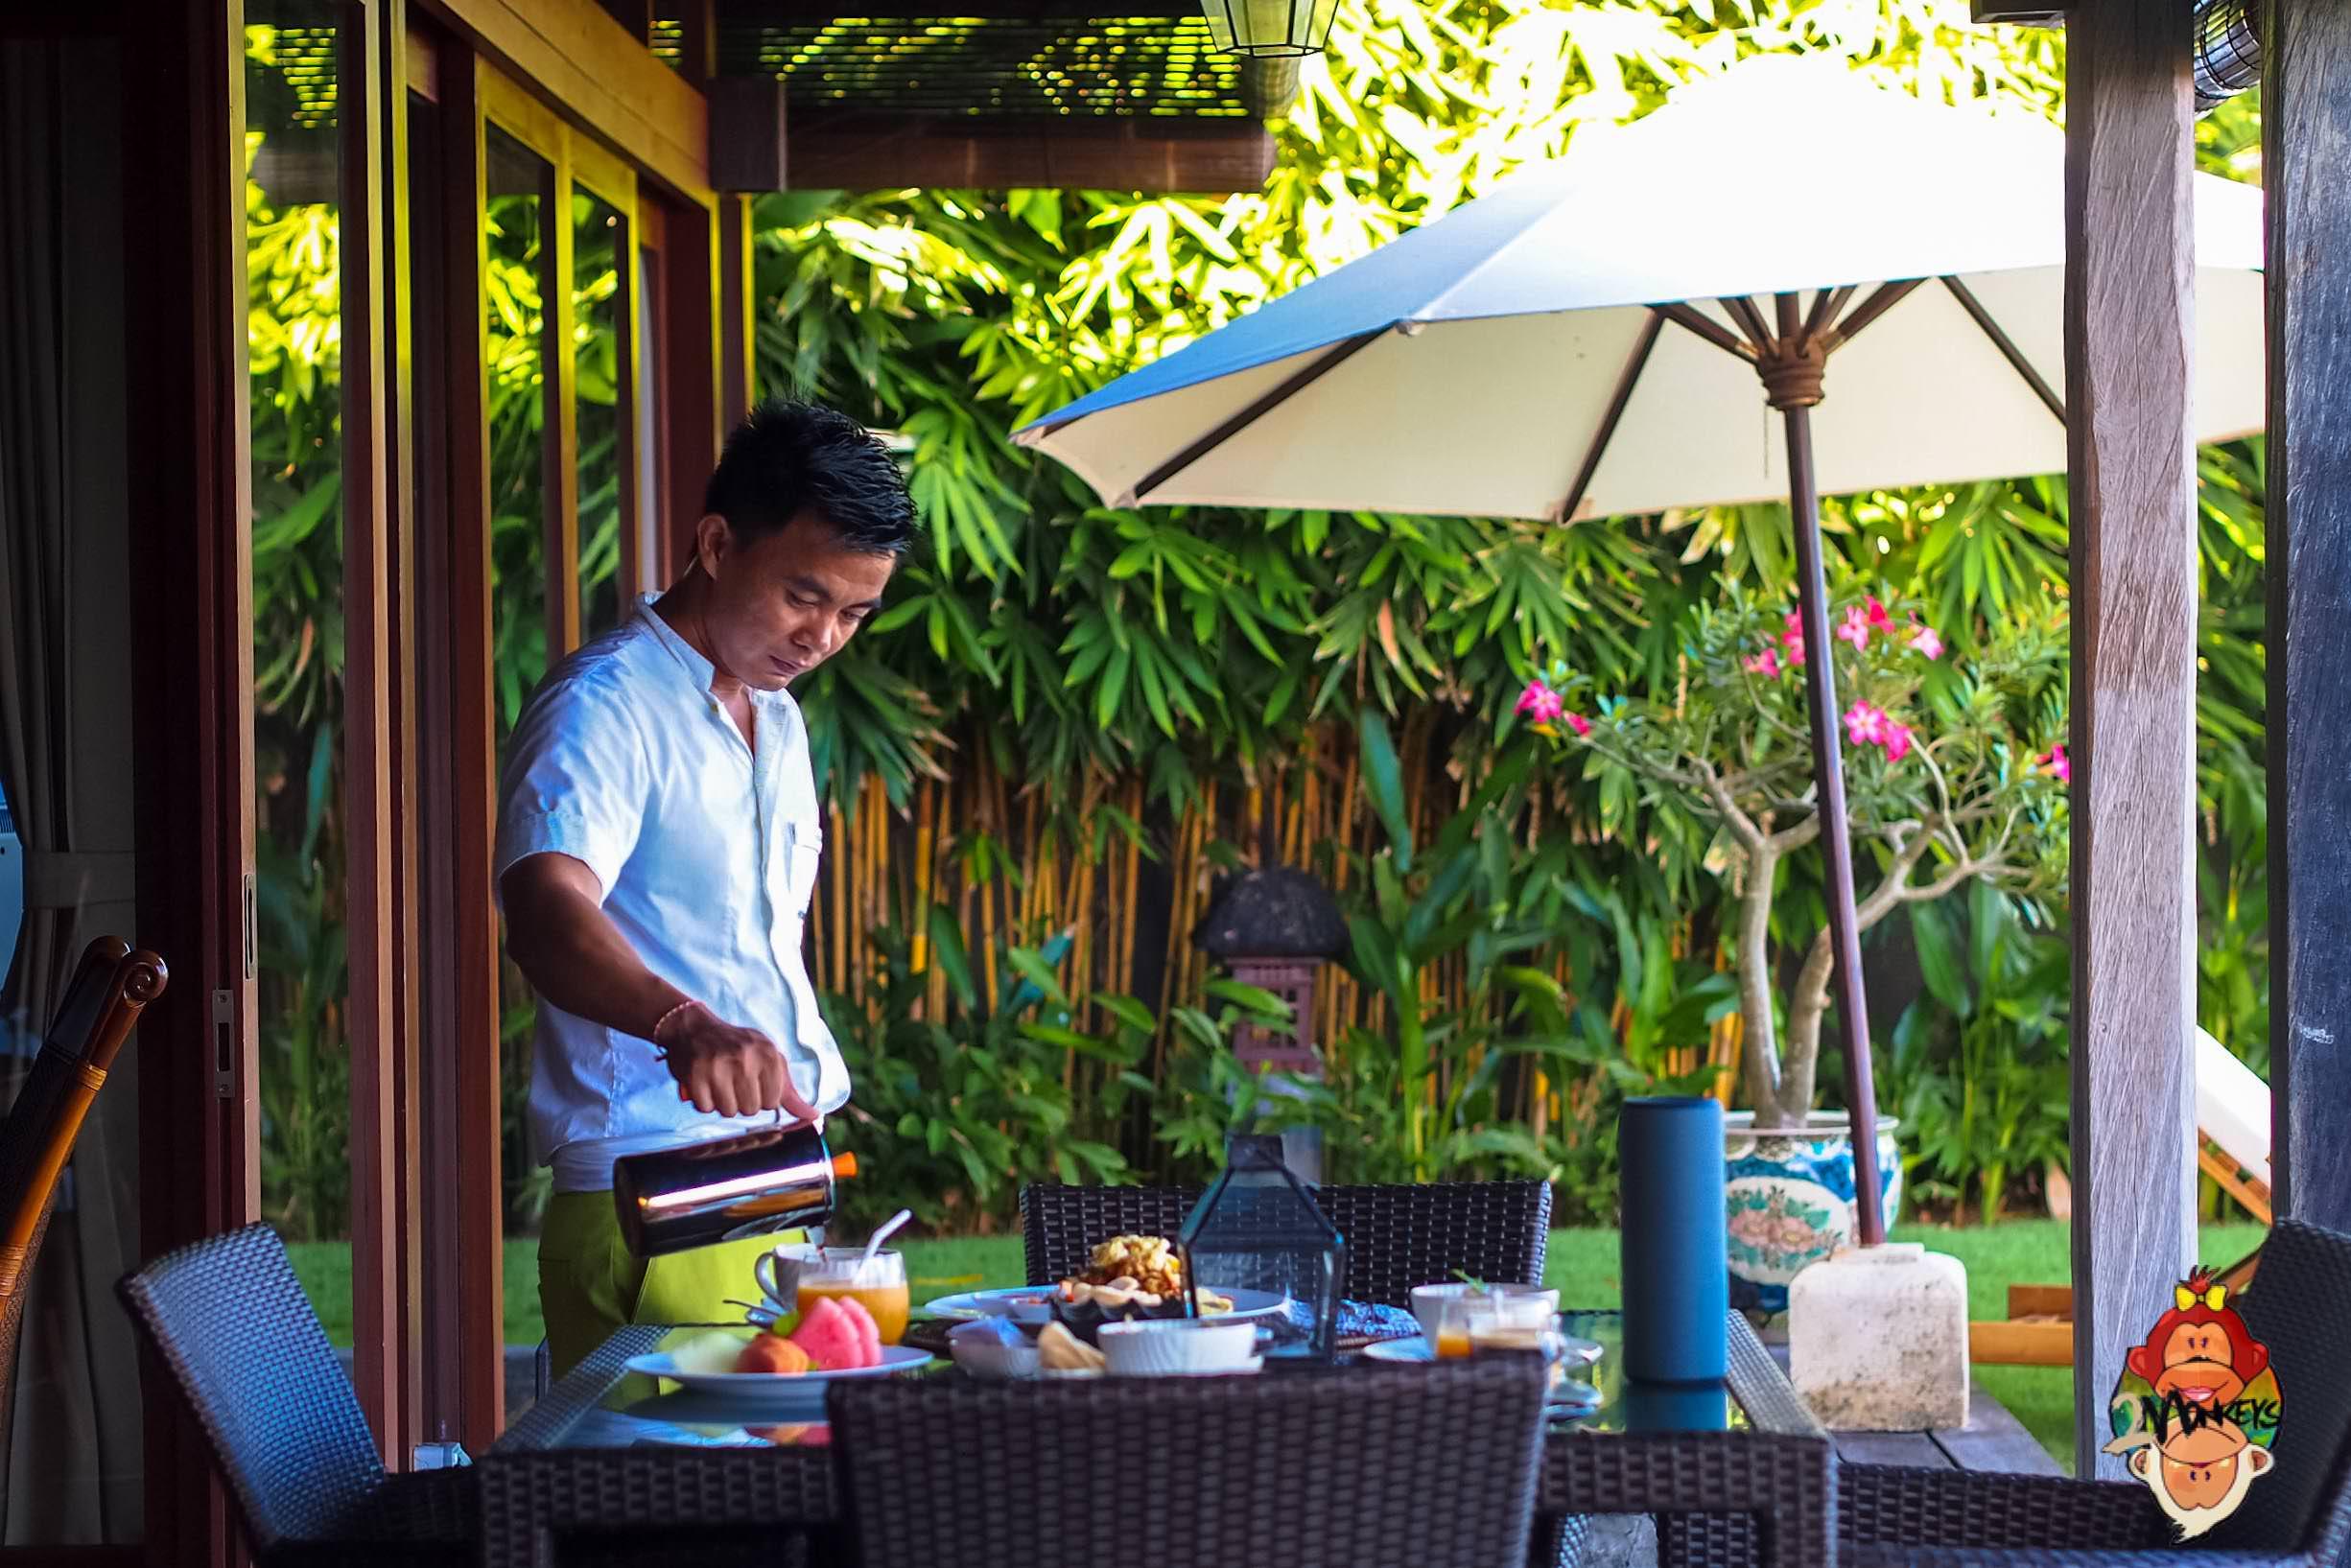 Luxury Hotel Review - Hidden Hills Villas Bali